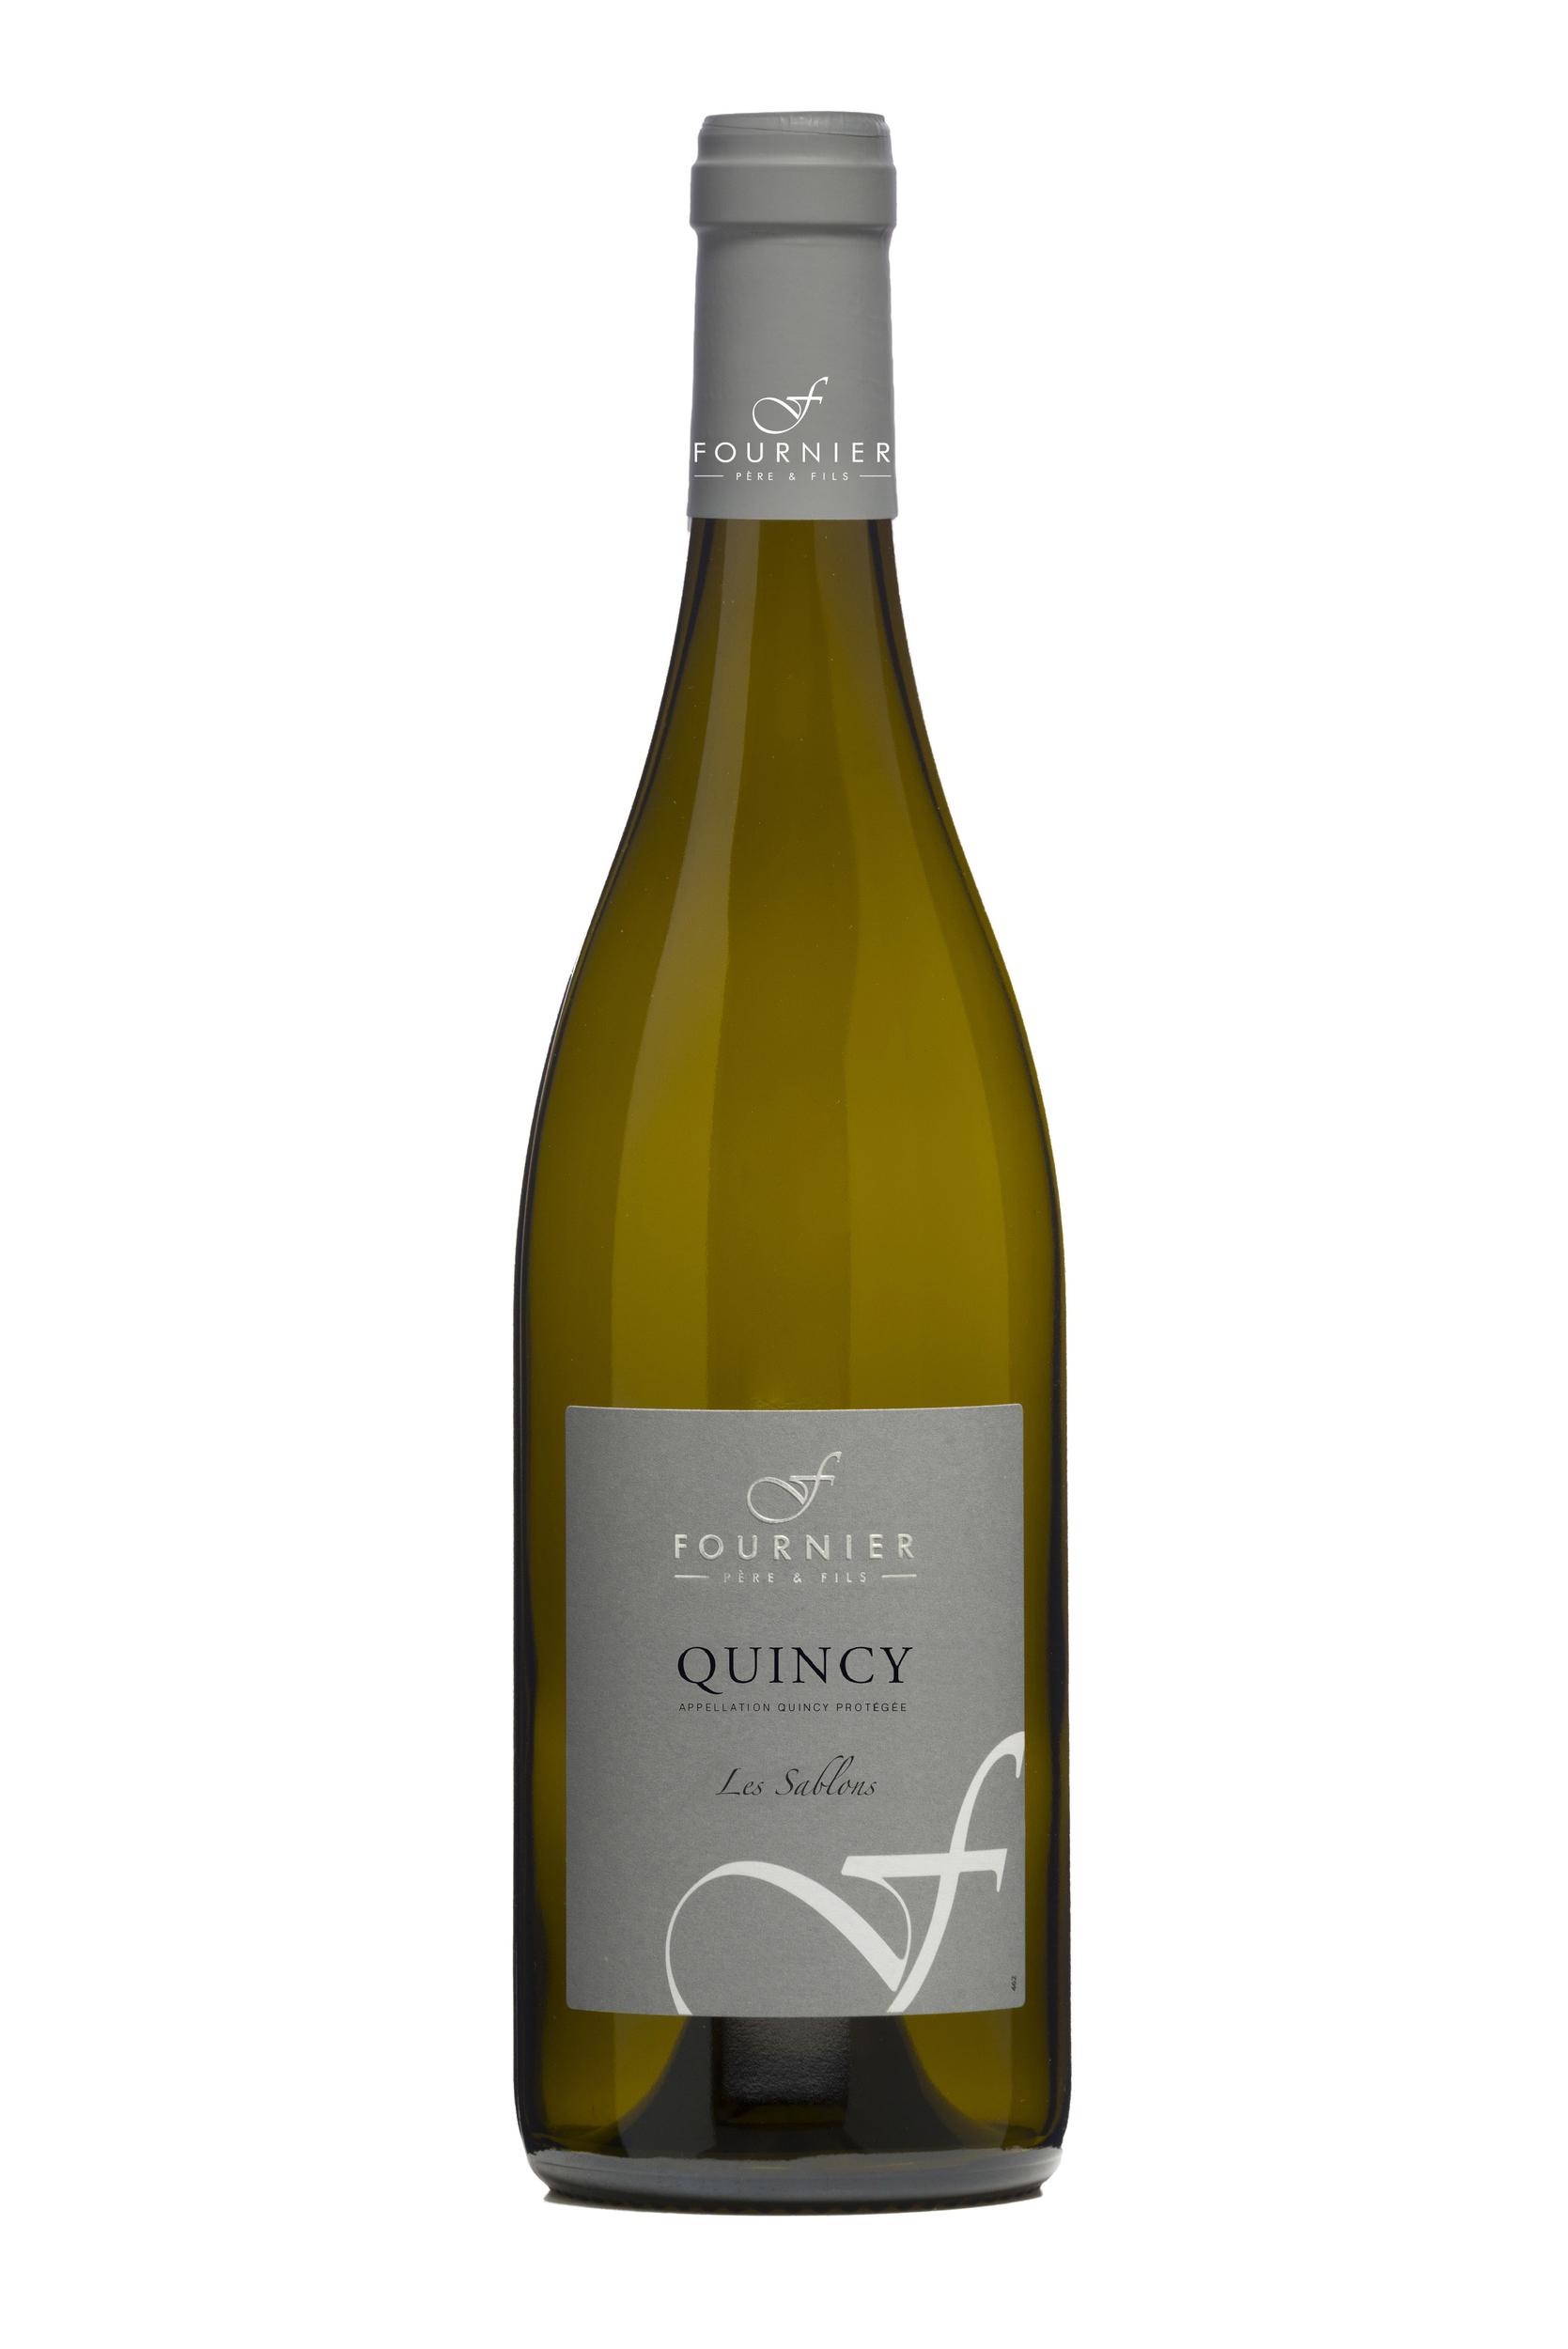 Quincy - Blanc - Domaine Fournier - 2019